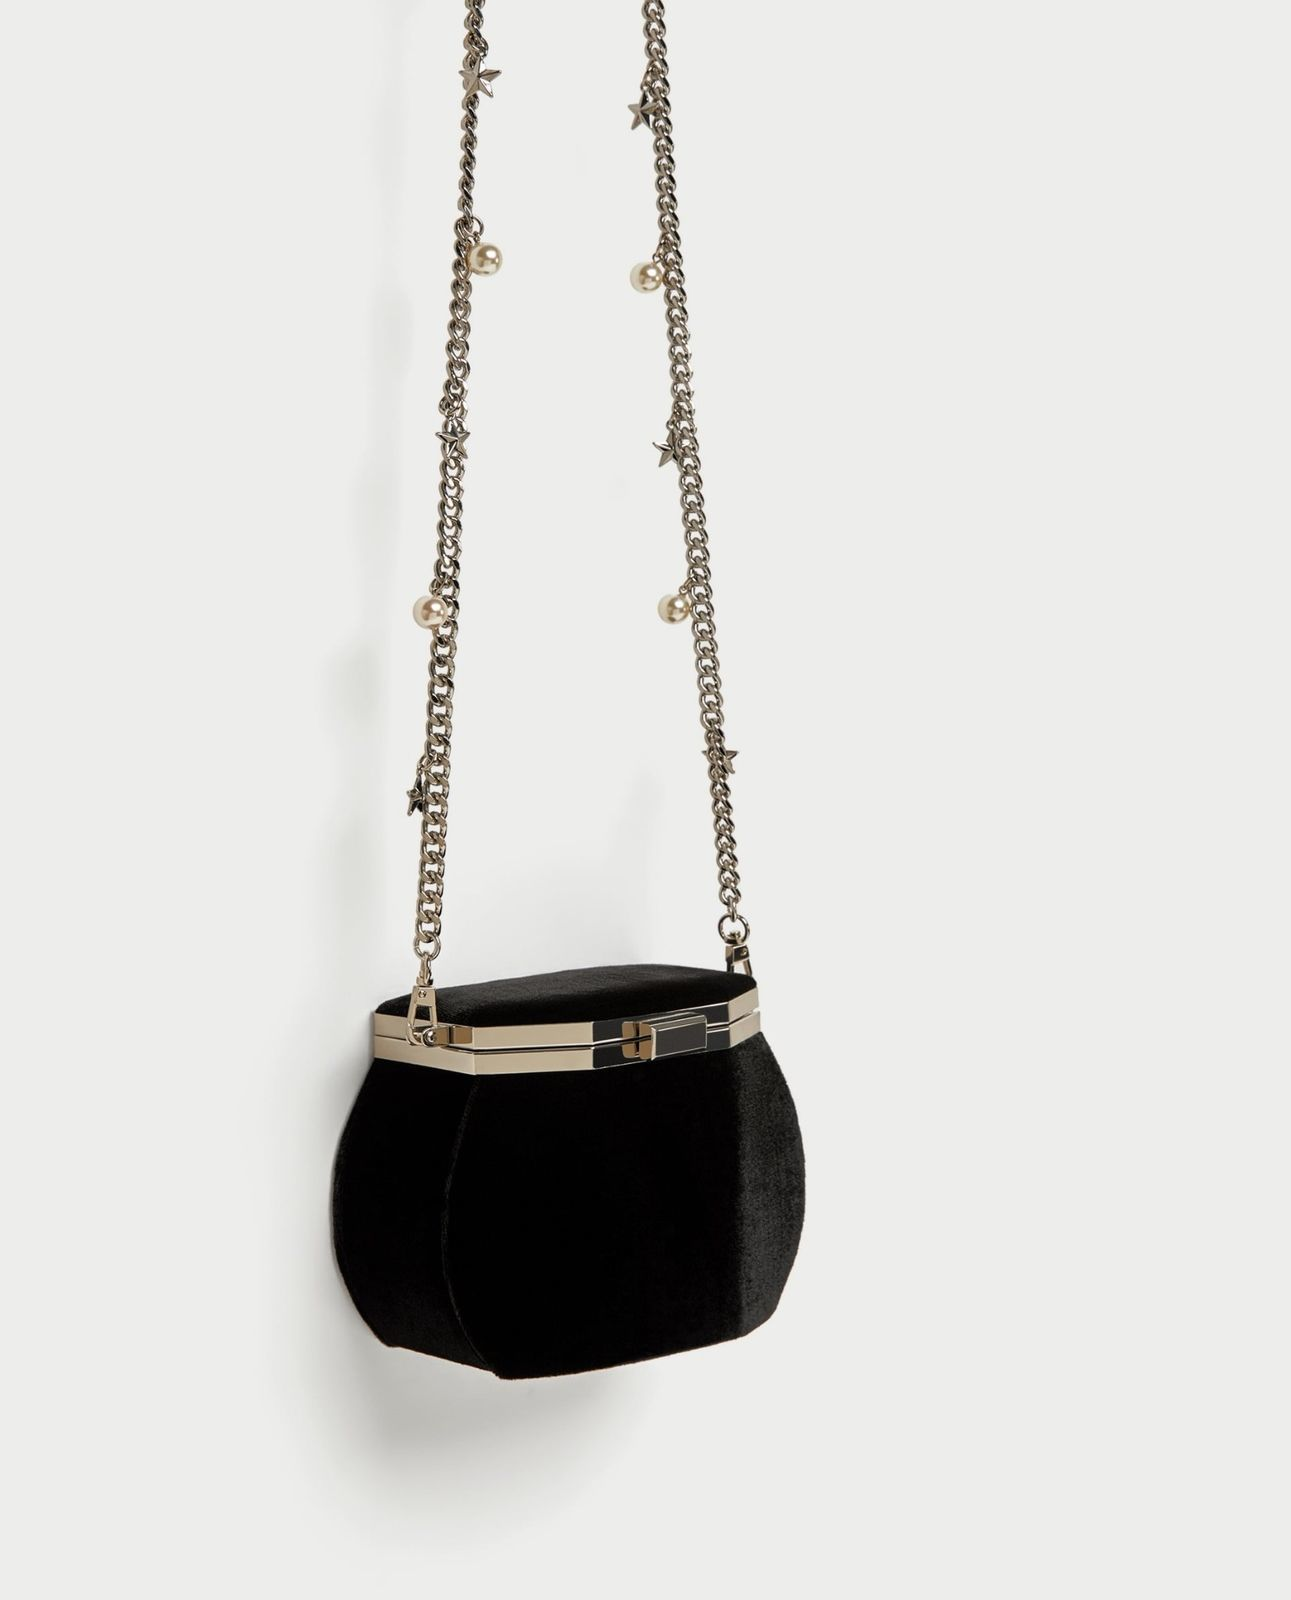 567f08468c BNWT ZARA Black Crossbody Bag With Clasp And Charm Strap REF.8377/204